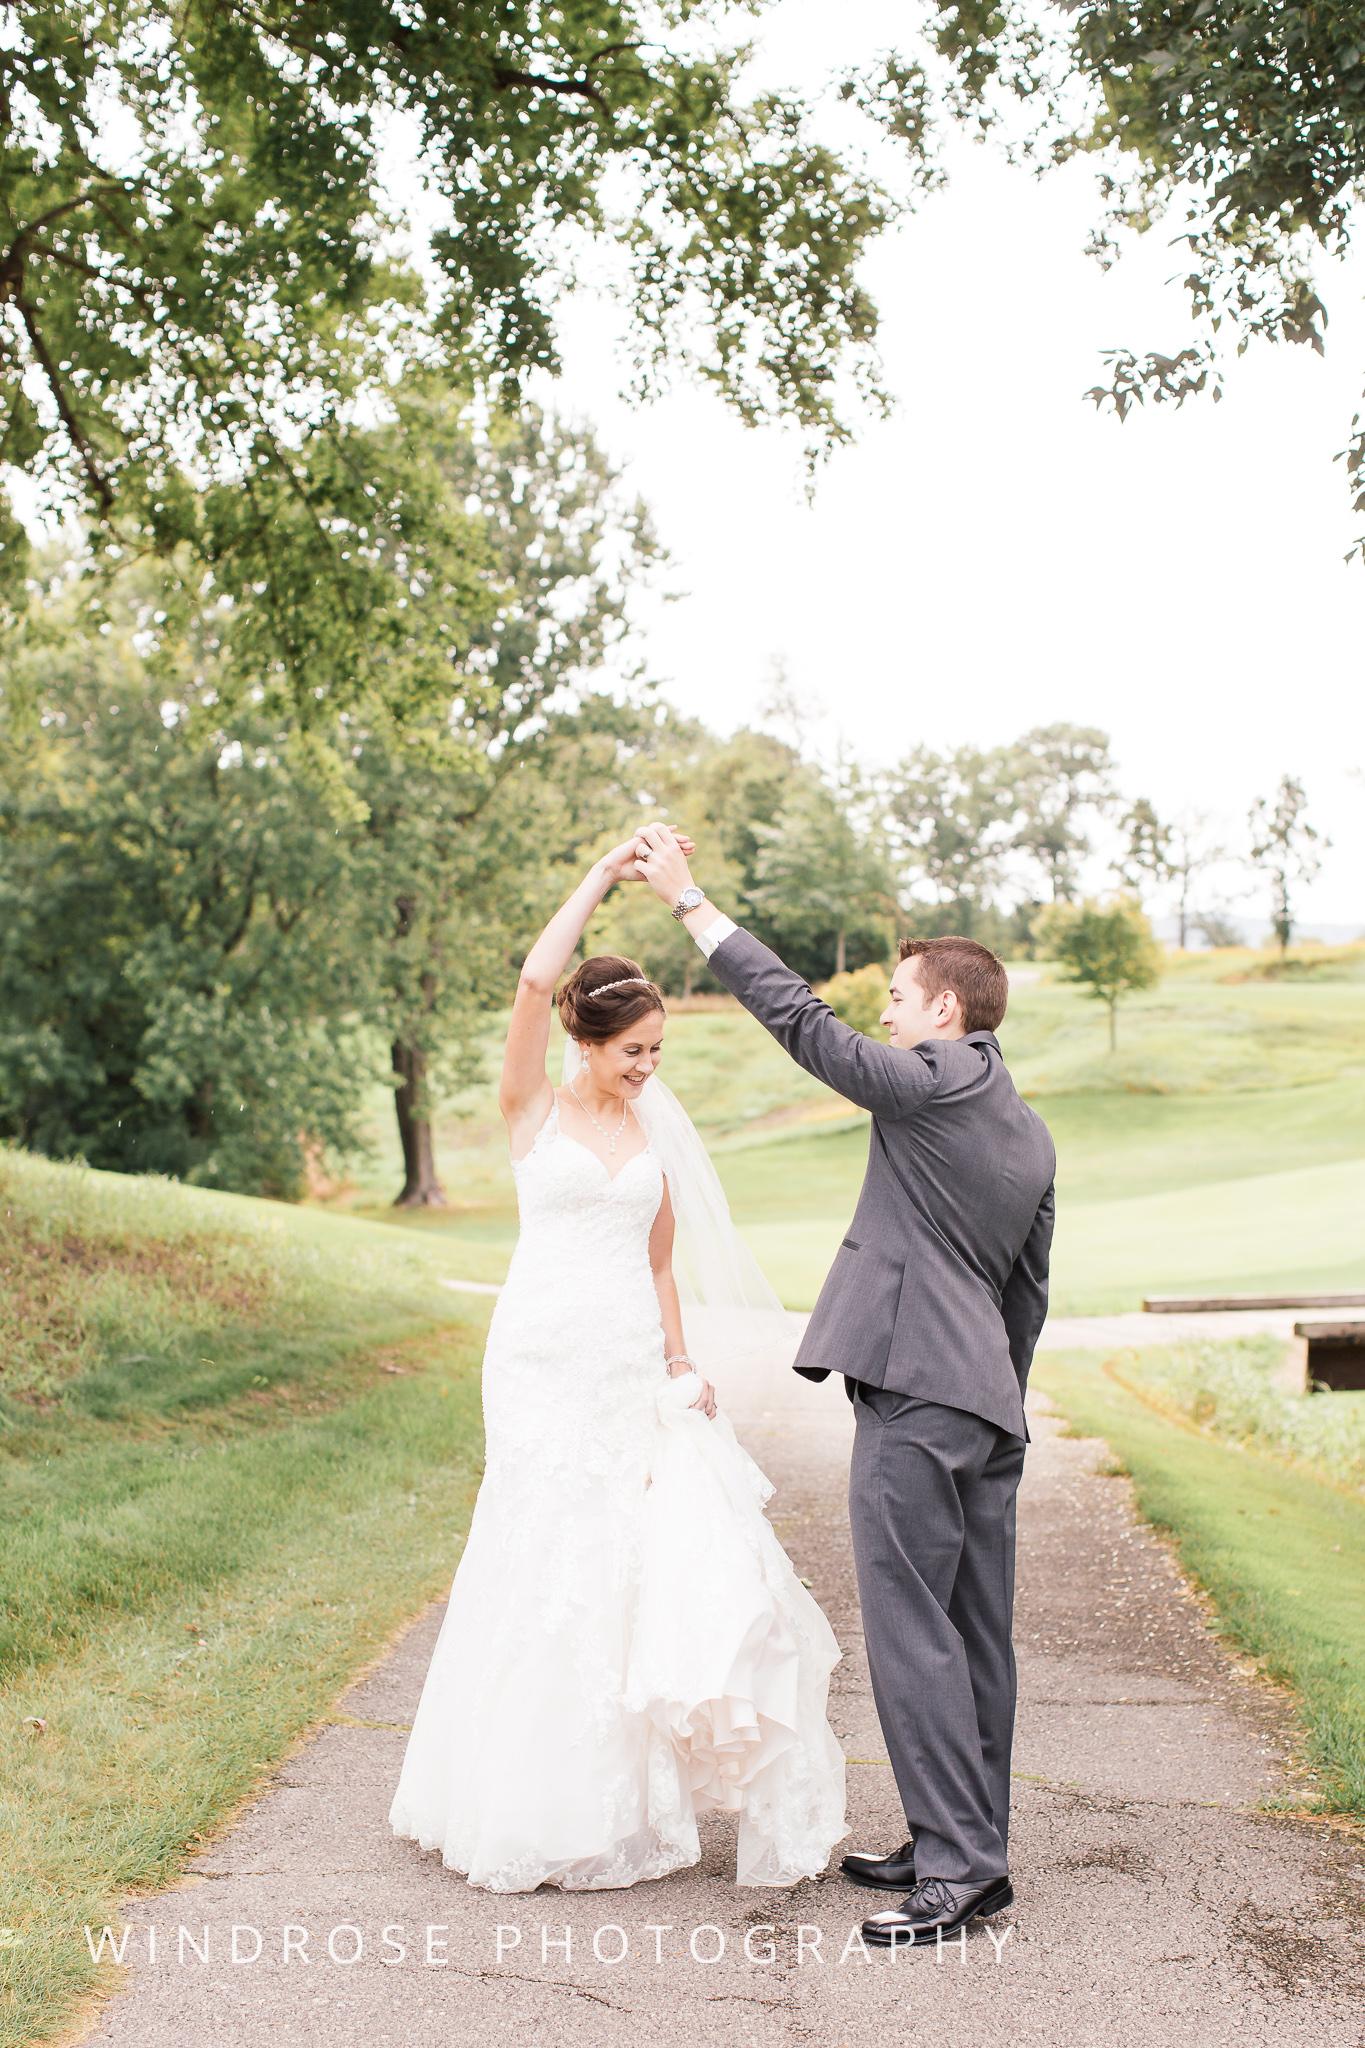 La-Crosse-Country-Club-Wedding-Minnesota-Wedding-Photographer-11.jpg